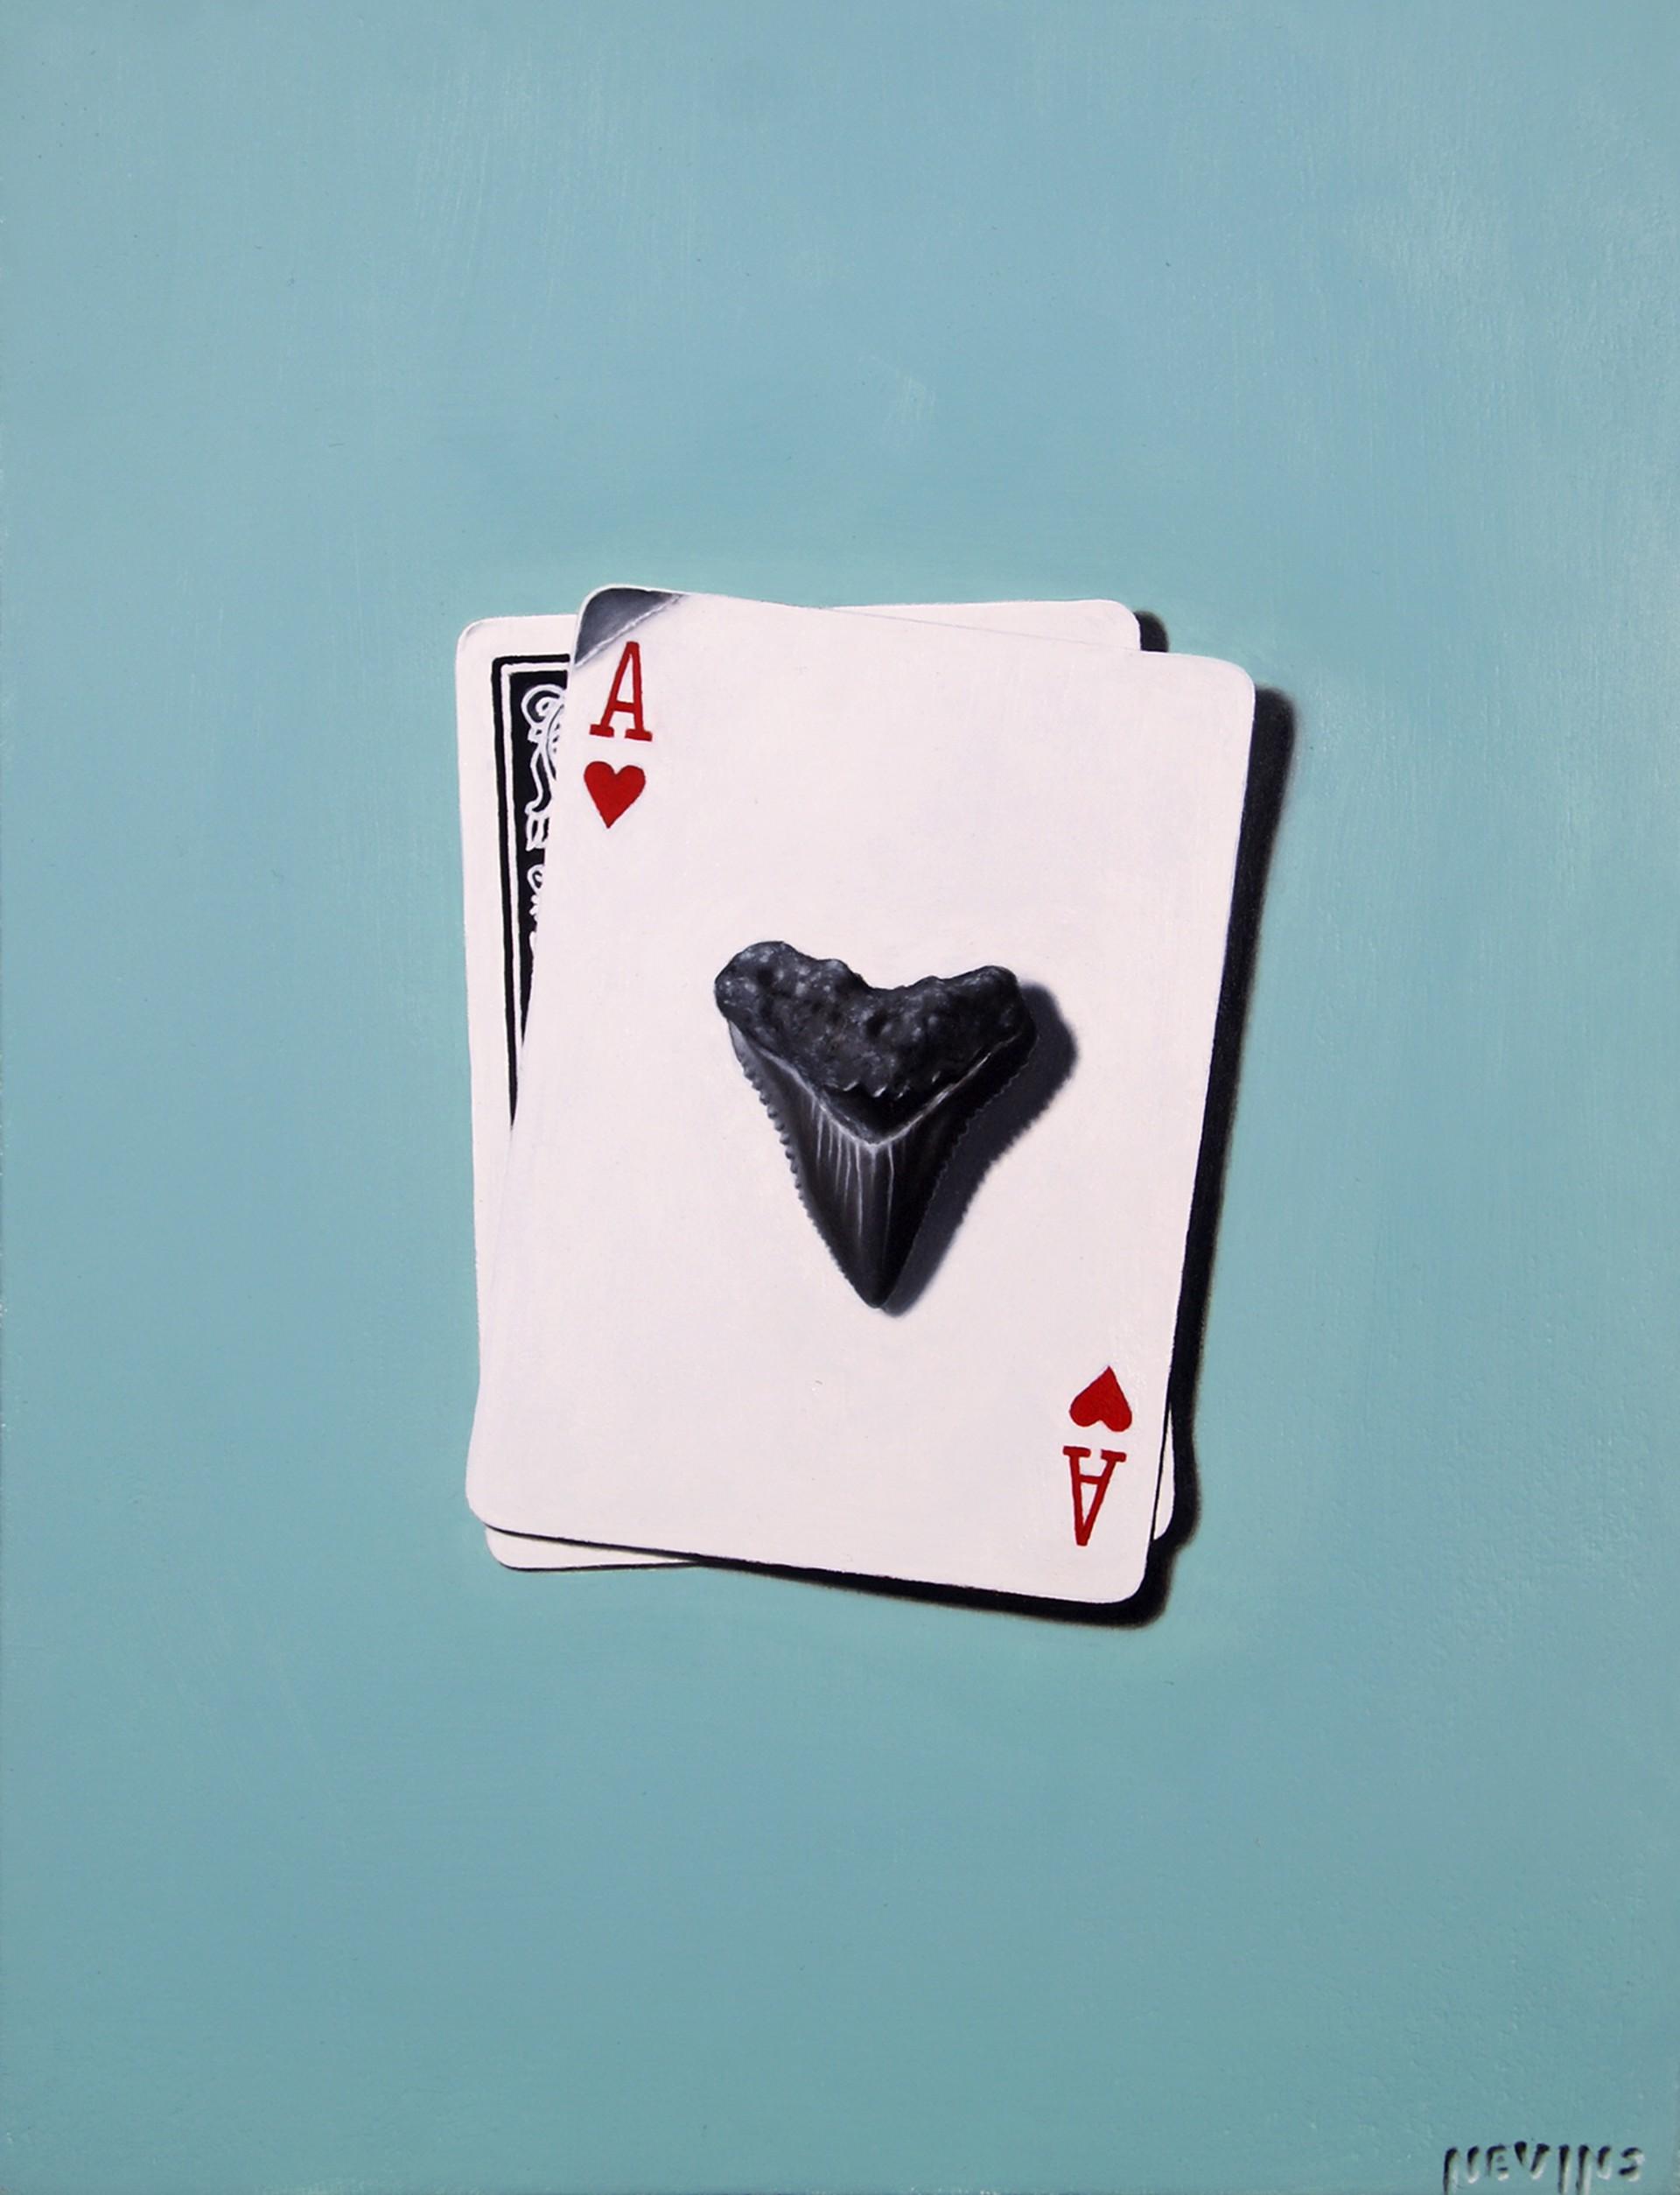 Card Shark  by Patrick Nevins